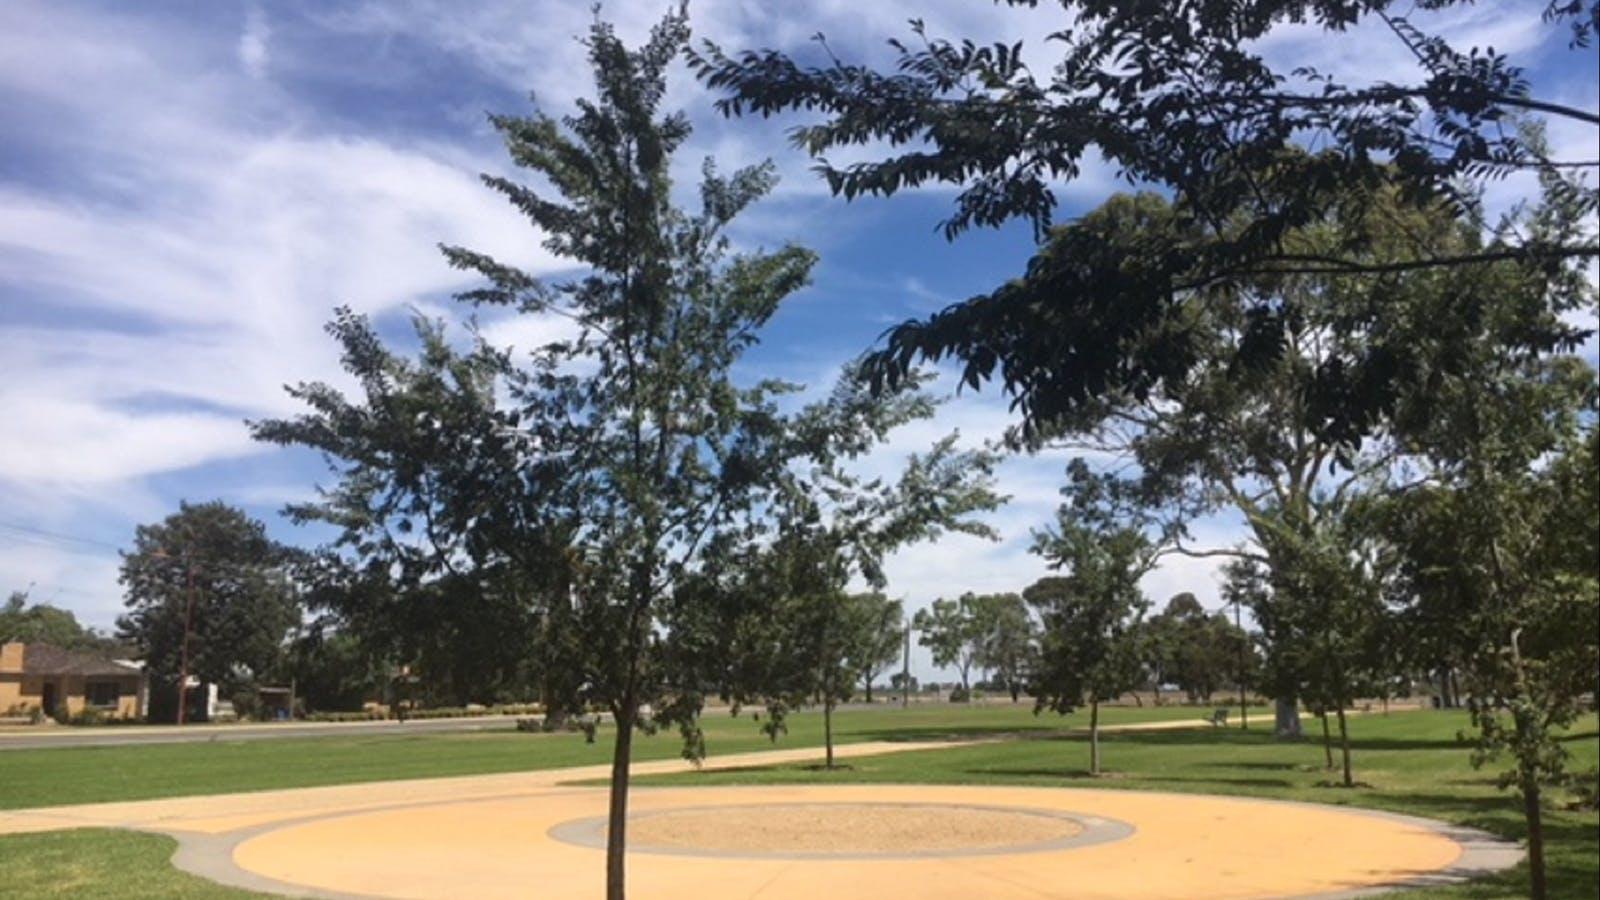 Federation/Lions Club Park